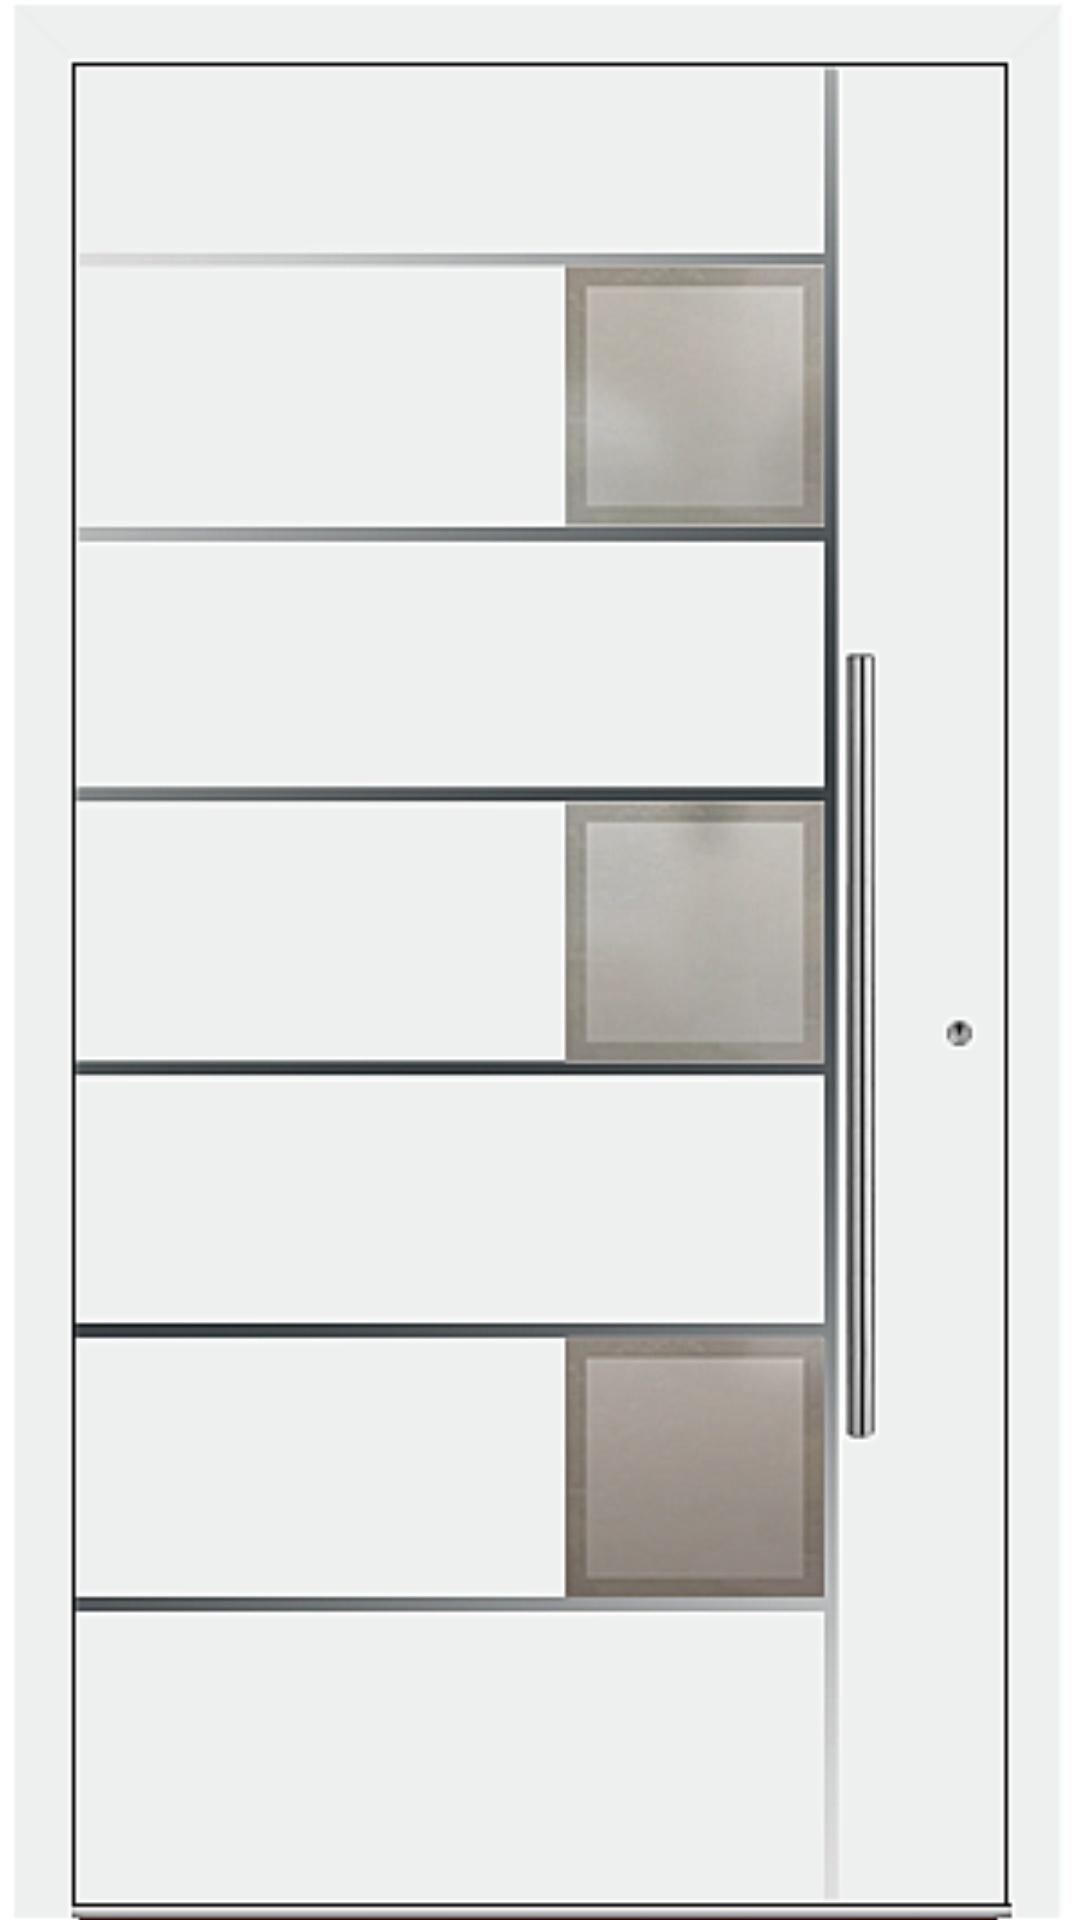 PaXentrée Aluminium Haustür M04341 weiß